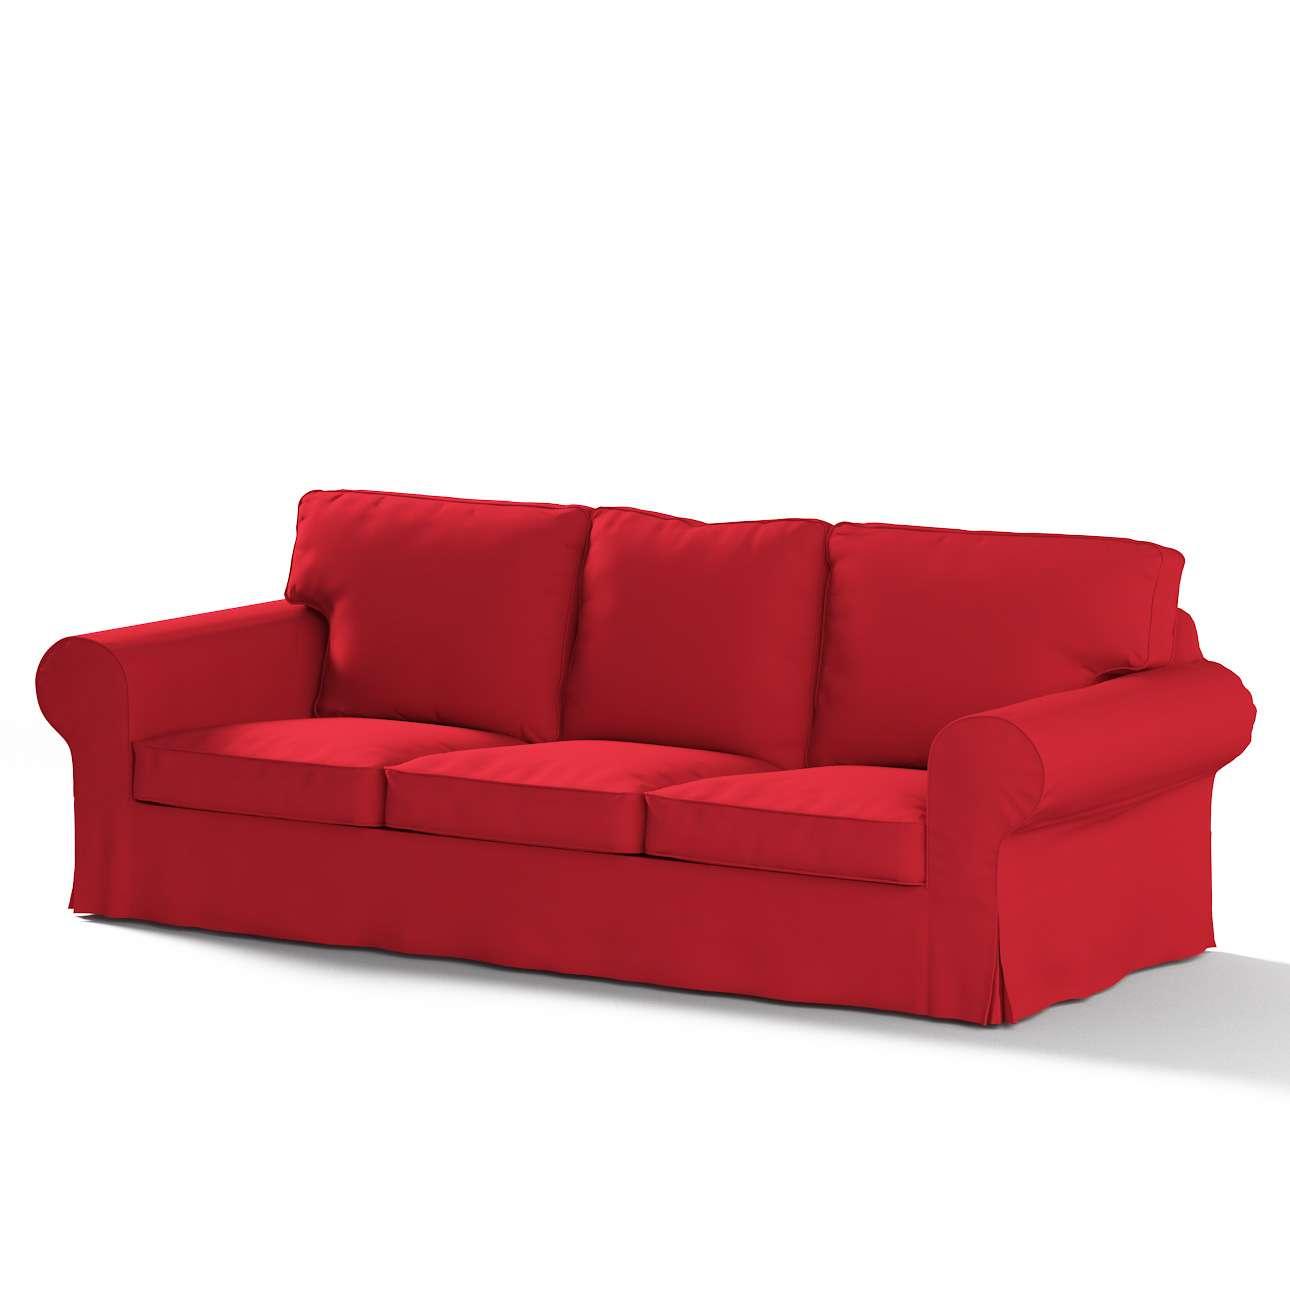 Ektorp 3-Sitzer Schlafsofabezug neues Modell (2013) Ektorp 3-Sitzer, ausklappbar, neues Modell ( 2013) von der Kollektion Cotton Panama, Stoff: 702-04